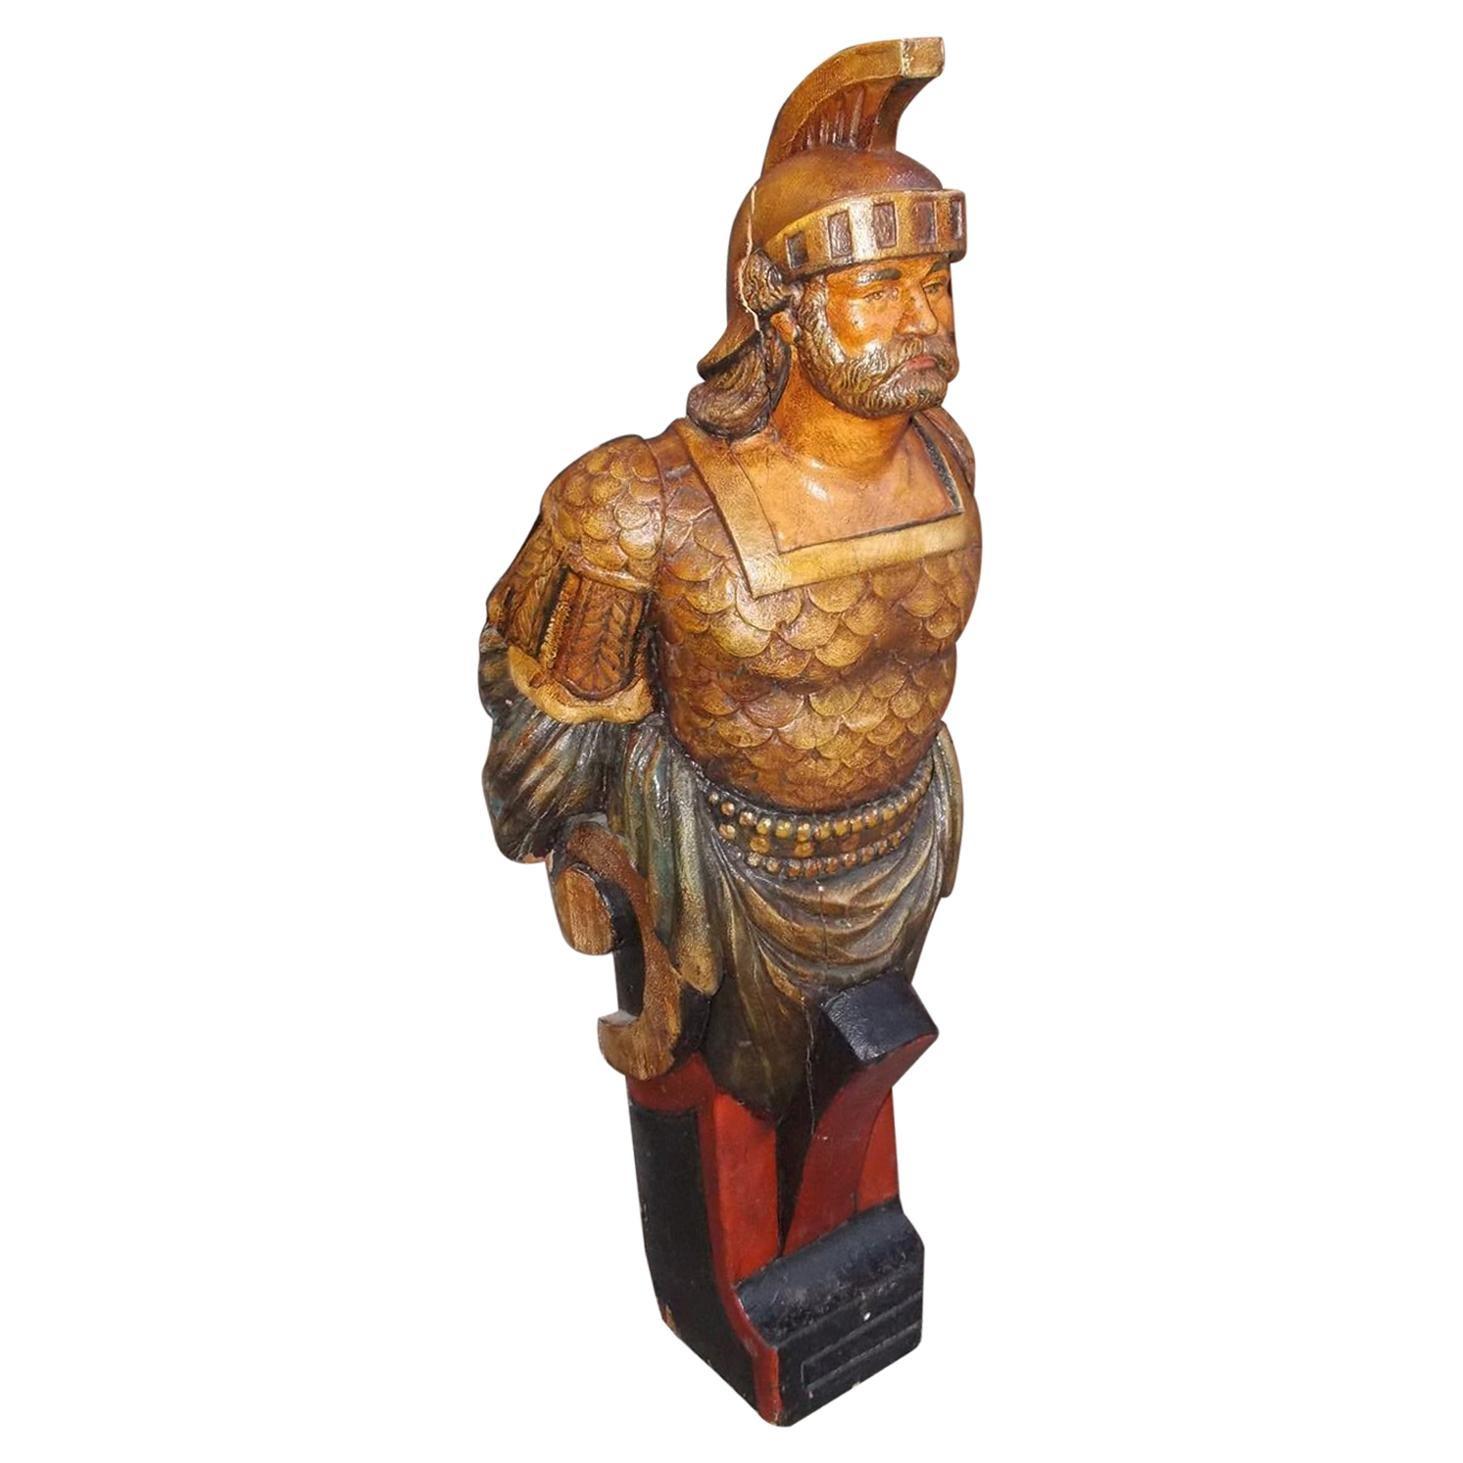 American Gilt Carved Wood and Poly Chromed Roman Guard Figurehead, Circa 1890